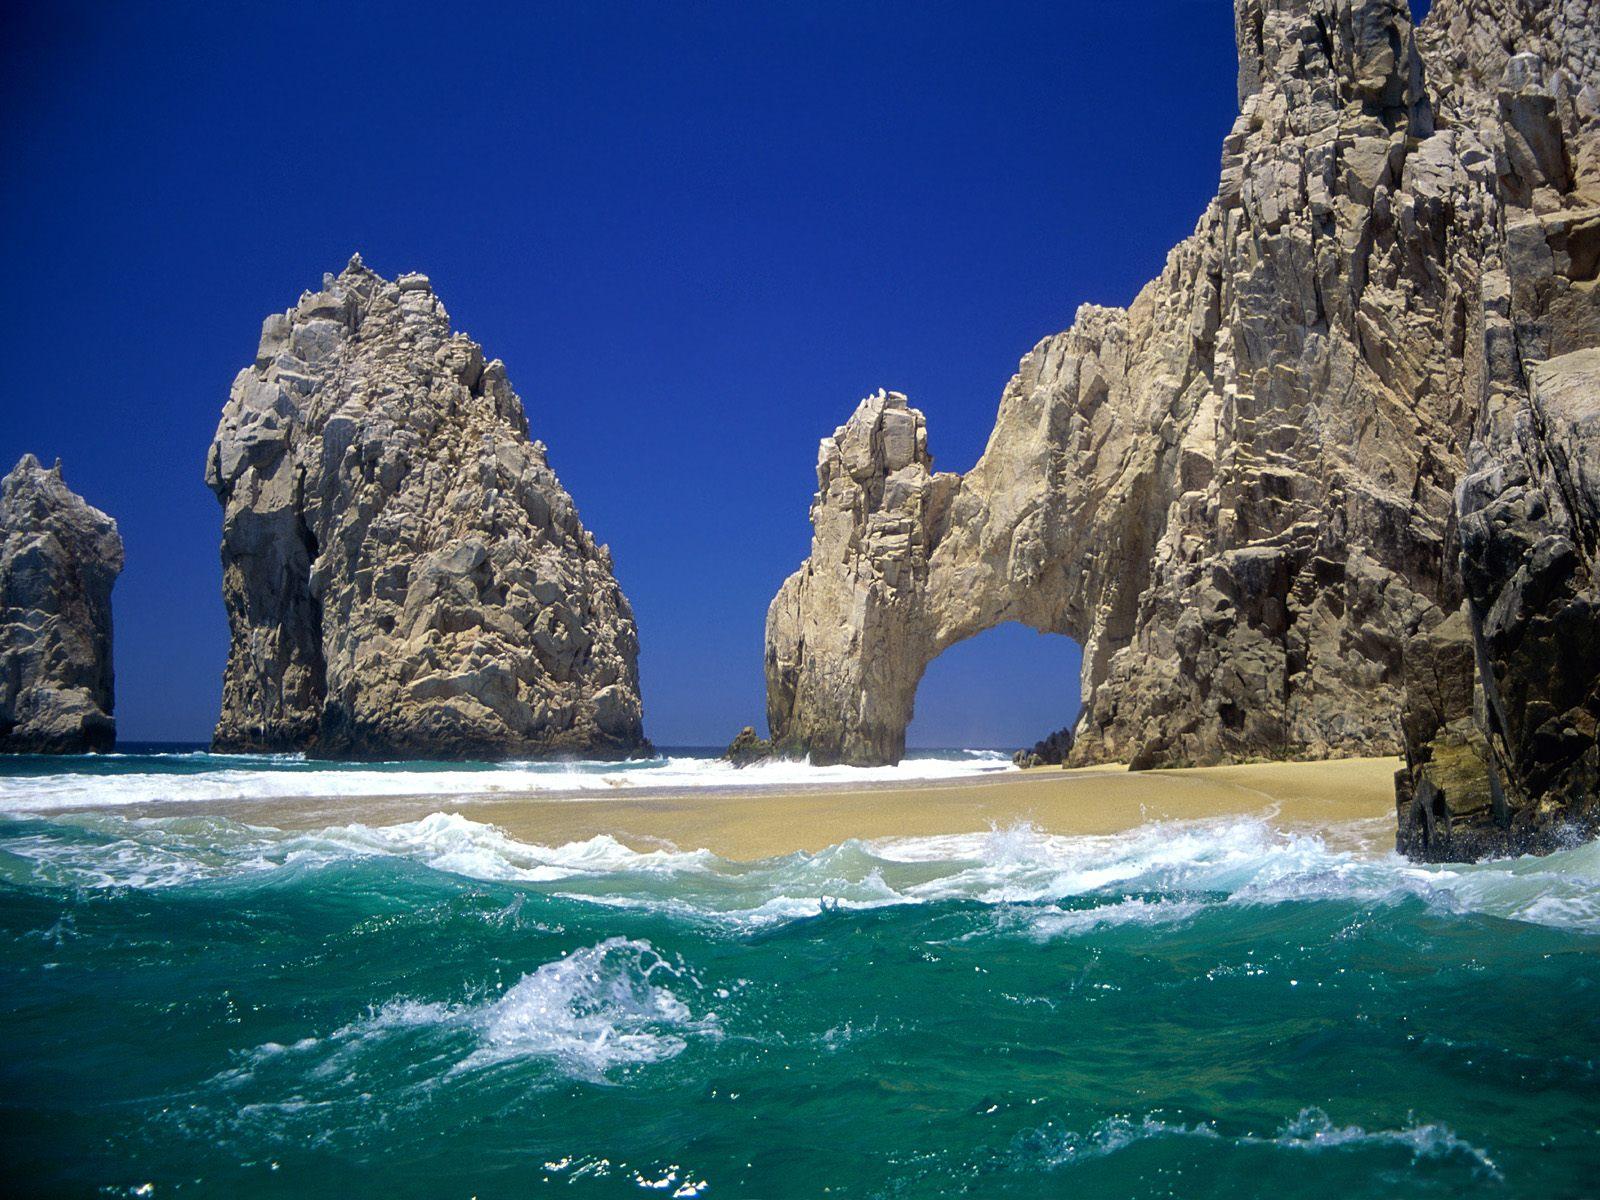 Cabo Loco Cruise Tickets Sat Nov 15 2014 At 3 00 Pm Eventbrite